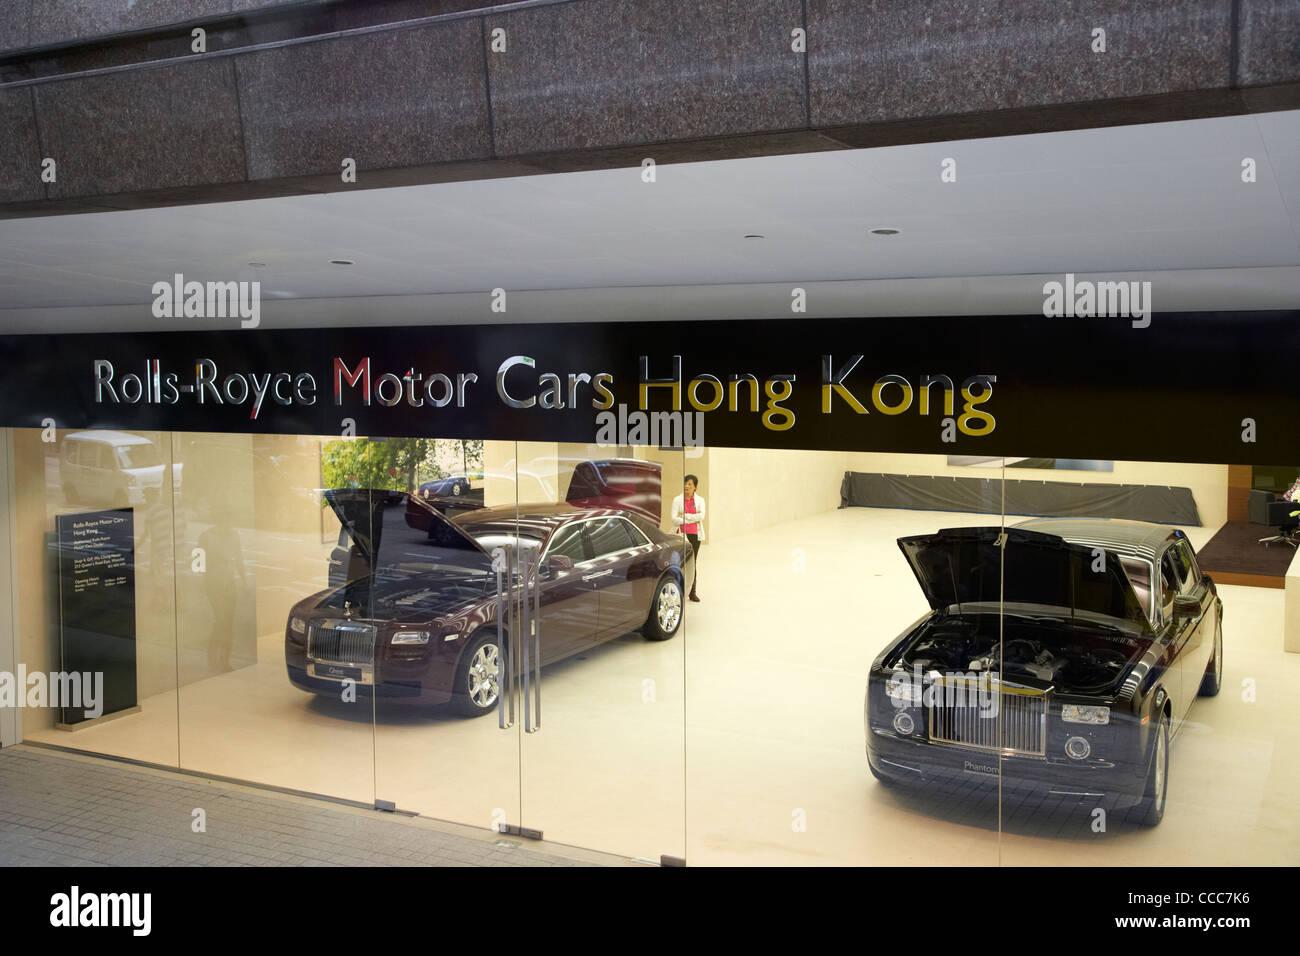 Rolls Royce Dealers >> Rolls Royce Car Dealership In Hong Kong Hksar China Asia